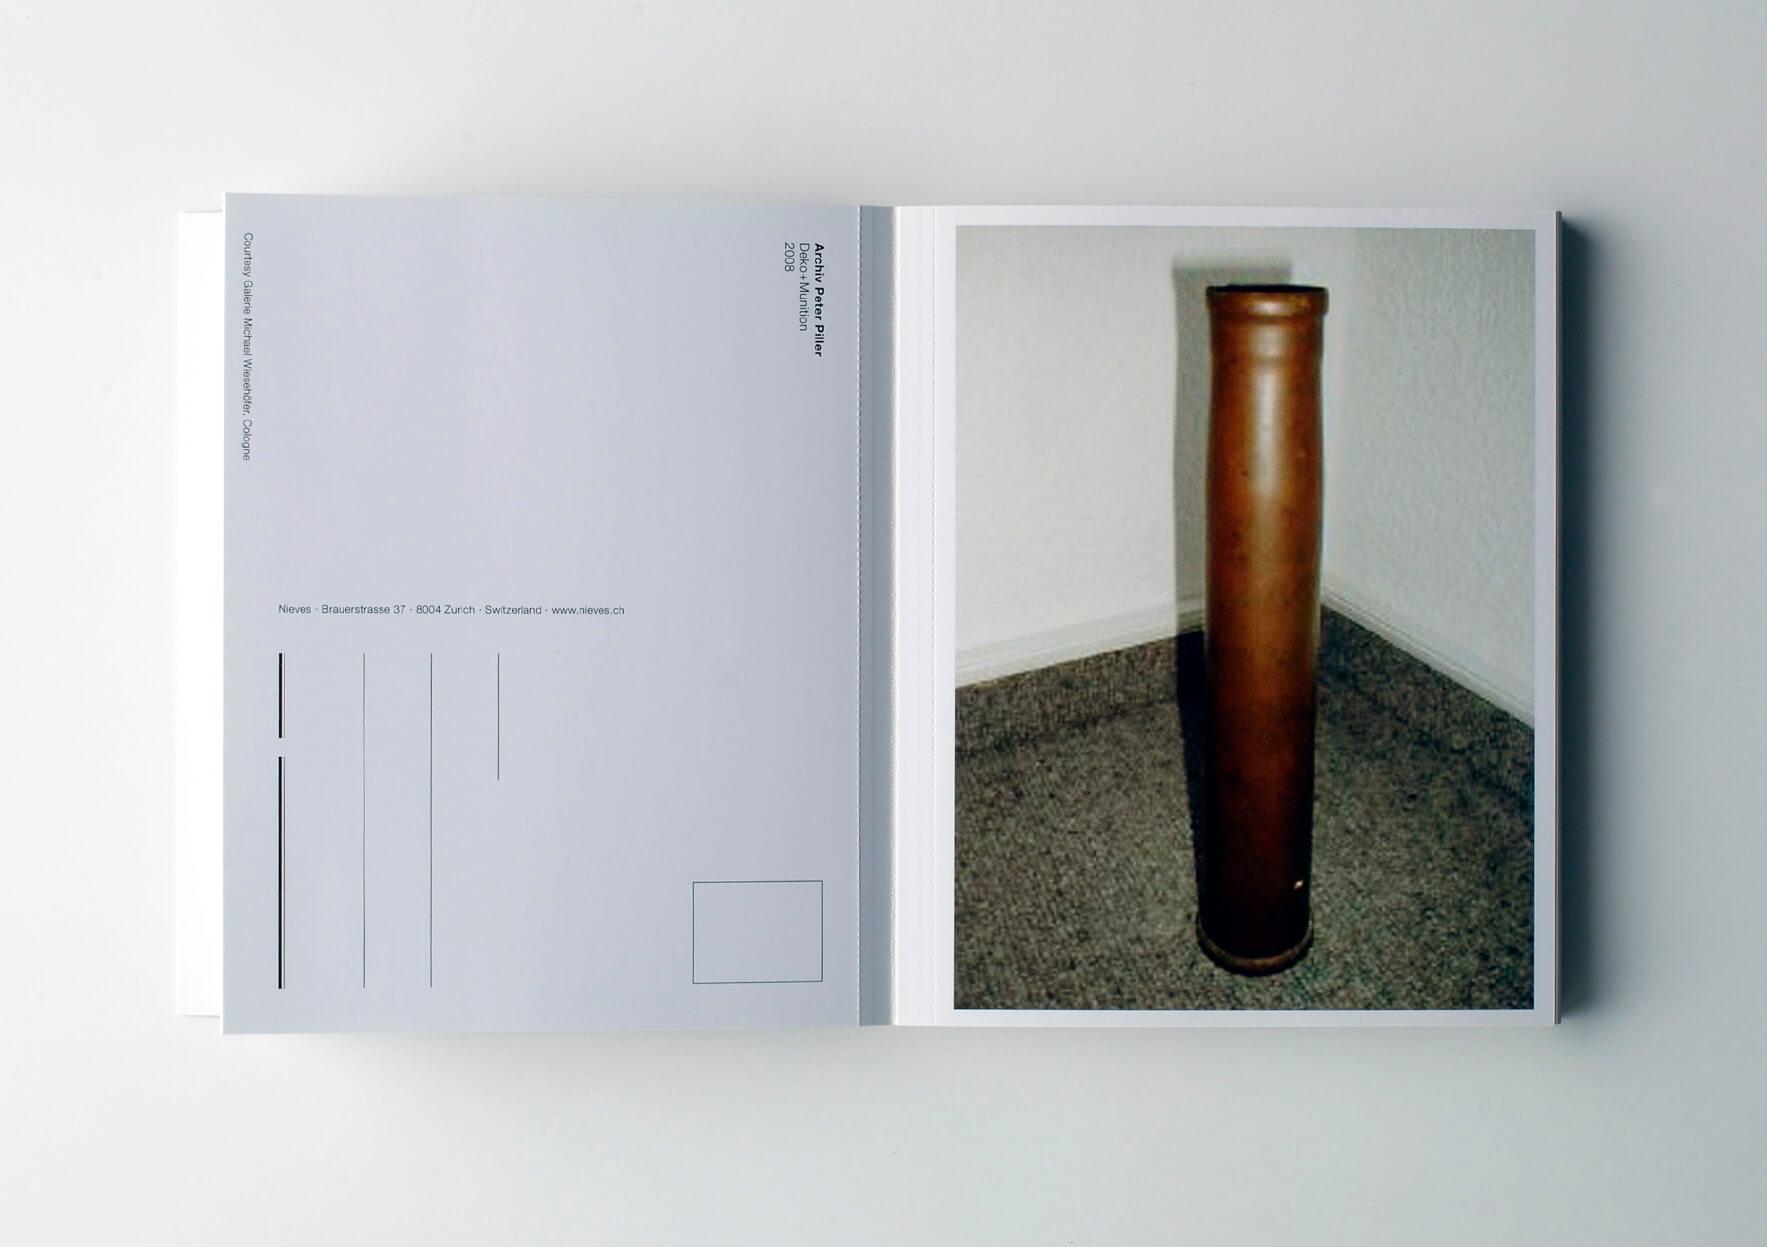 | Archiv Peter Piller: Deko + Munition | ProjecteSD